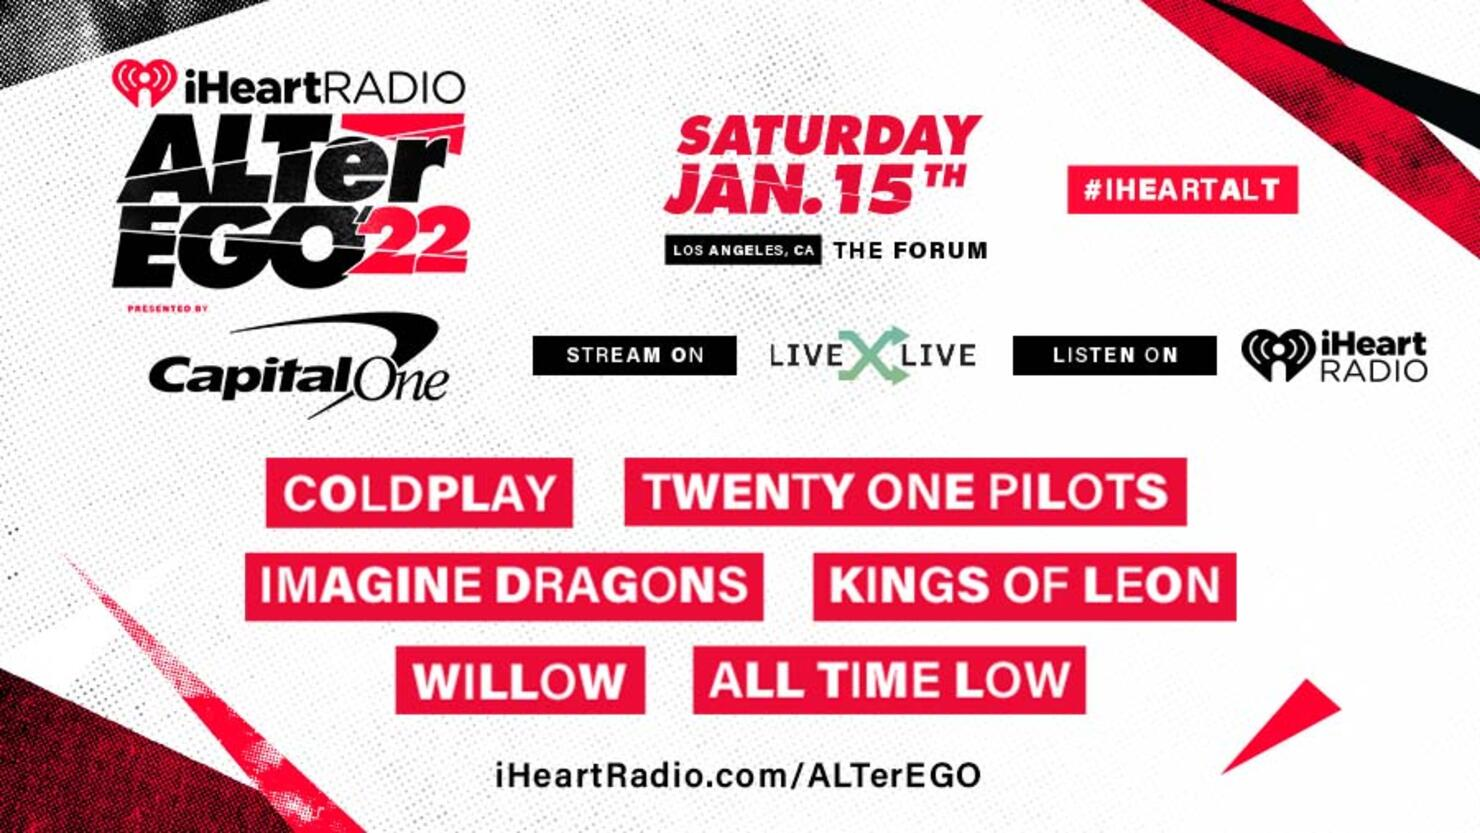 2022 iHeartRadio ALTer EGO Lineup: Coldplay, Twenty One Pilots & More    iHeartRadio